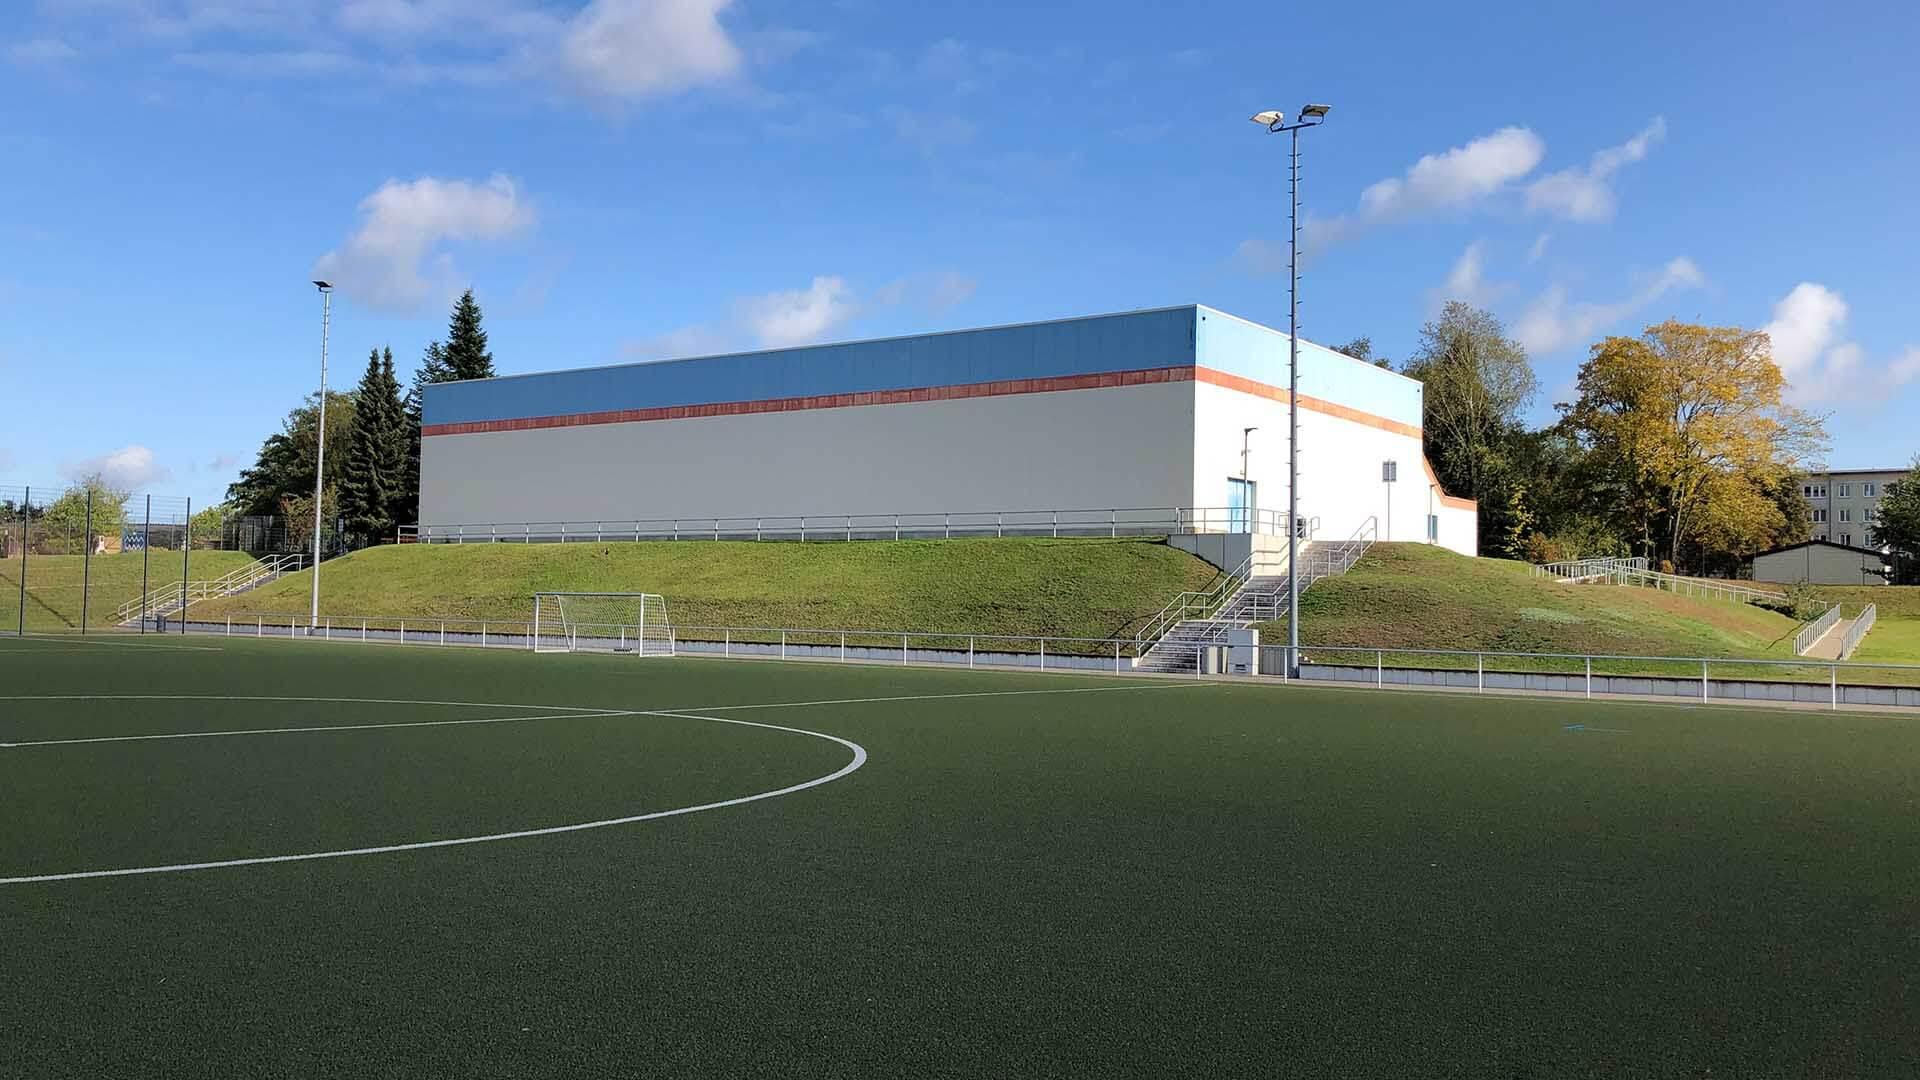 Sporthalle an der Naturpark-Schule in Krakow am See